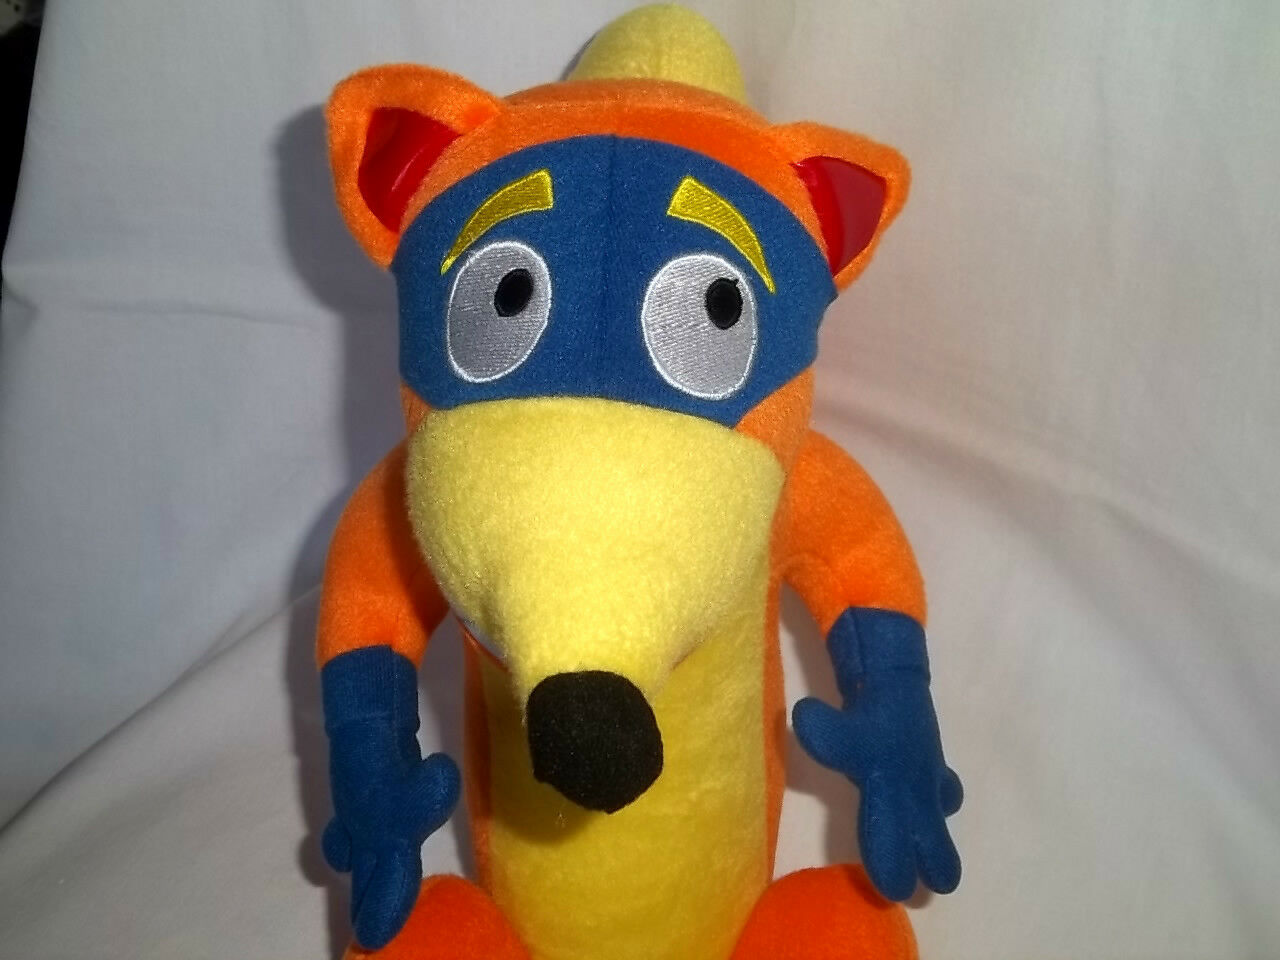 DORA THE EXPLORER EXPLORER EXPLORER 15  Plush SWIPER FOX Large Stuffed Animal Toy Big Mask orange ac9bfa